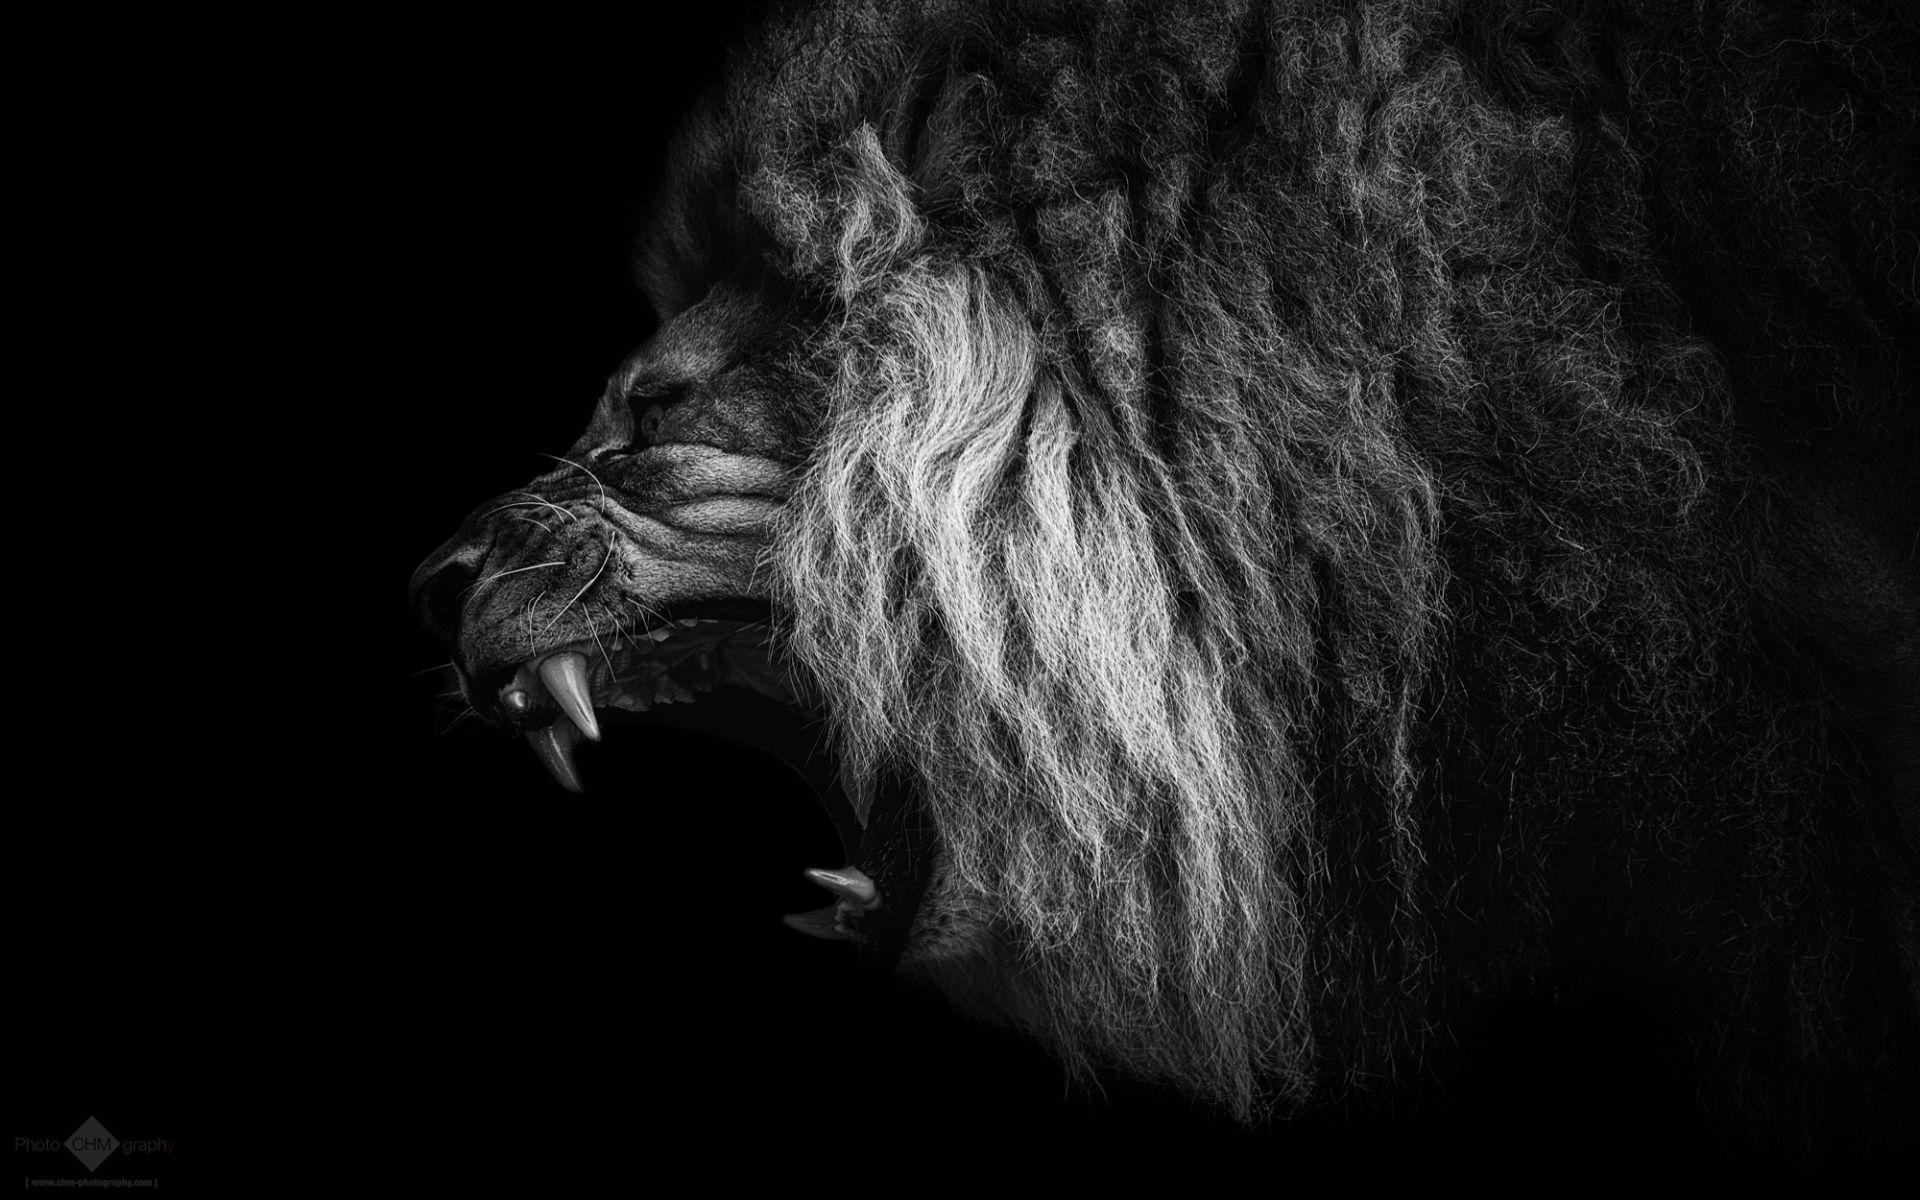 Lion Black And White Animal Pic